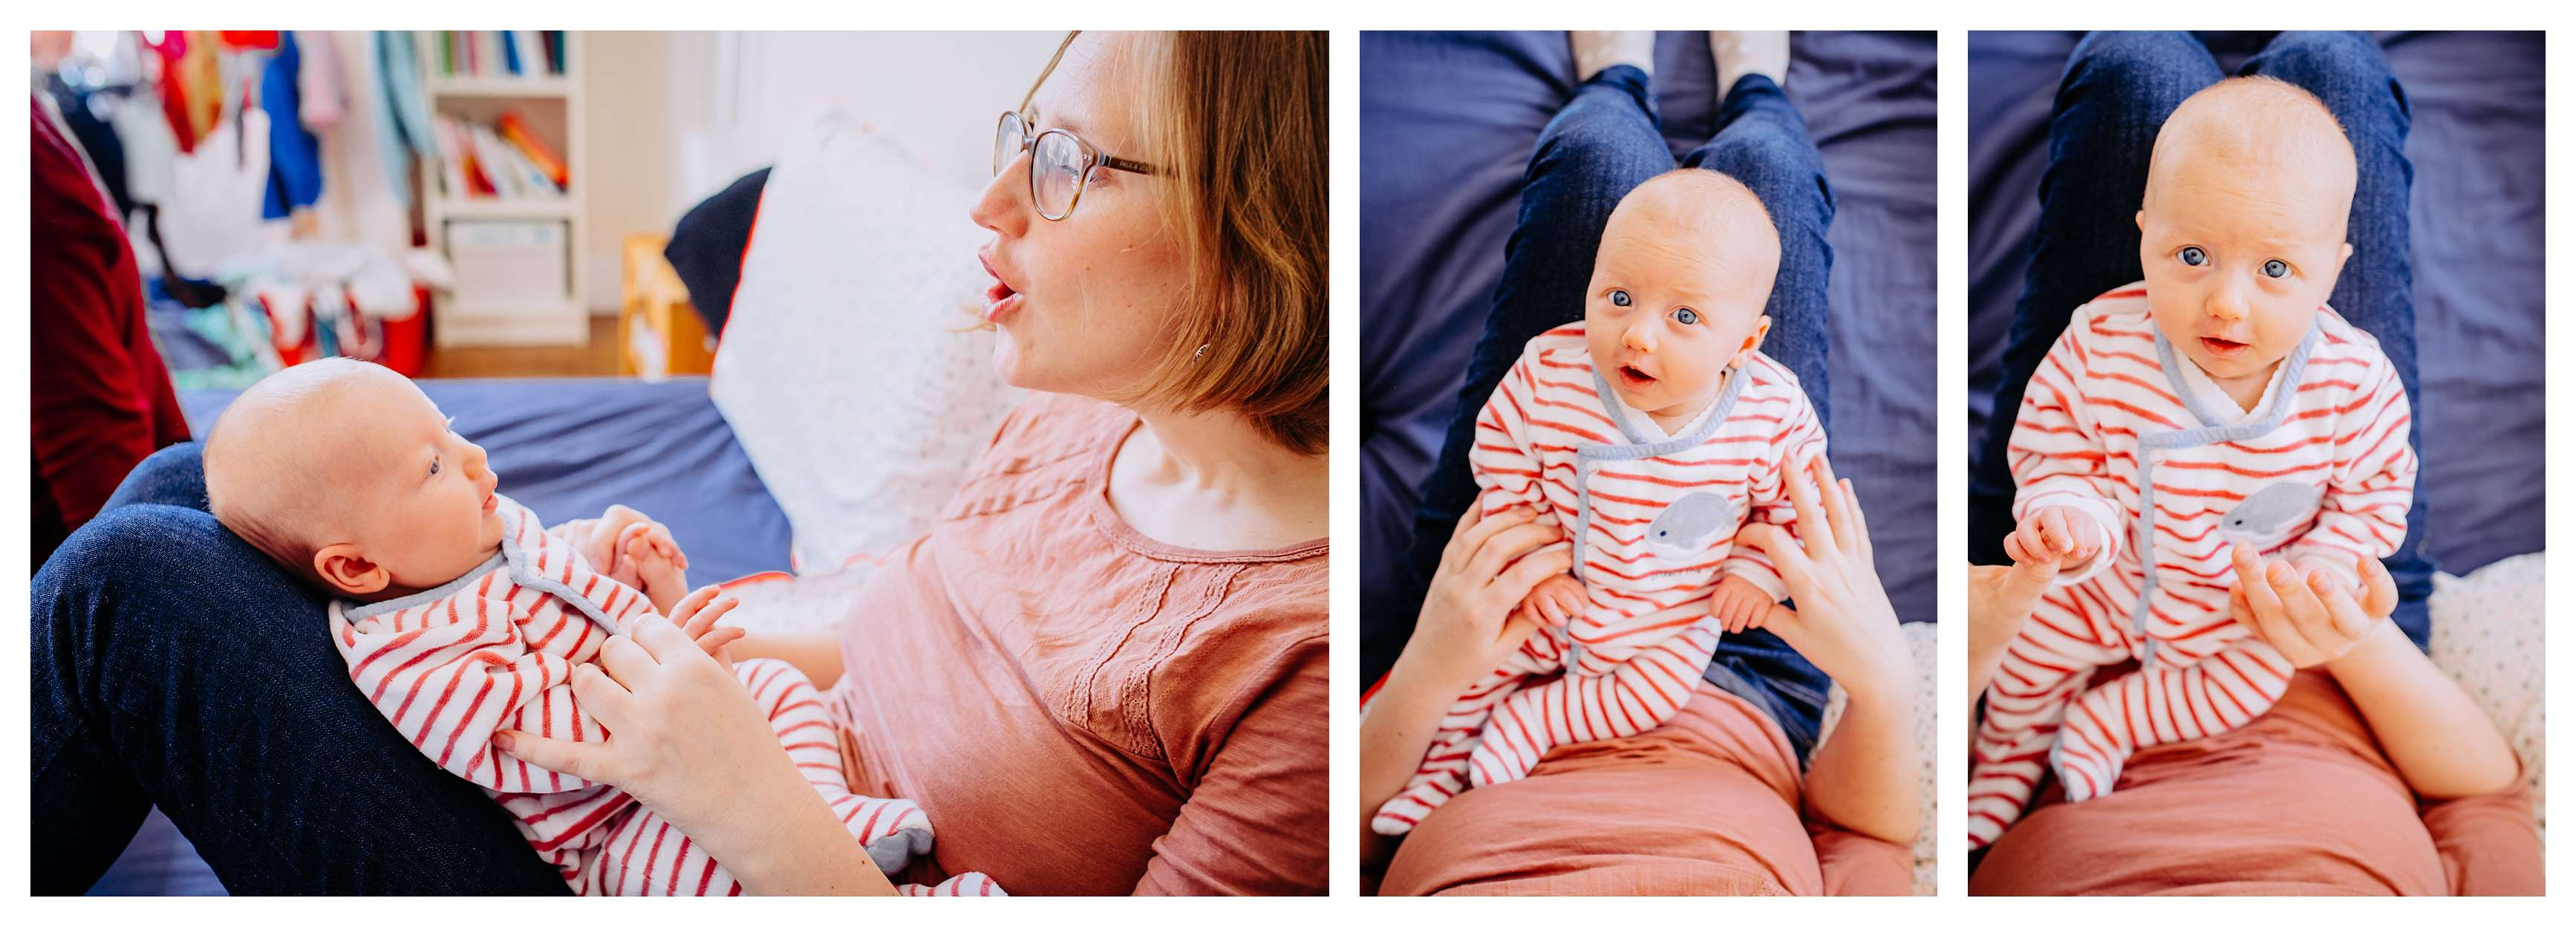 séance bébé avec maman